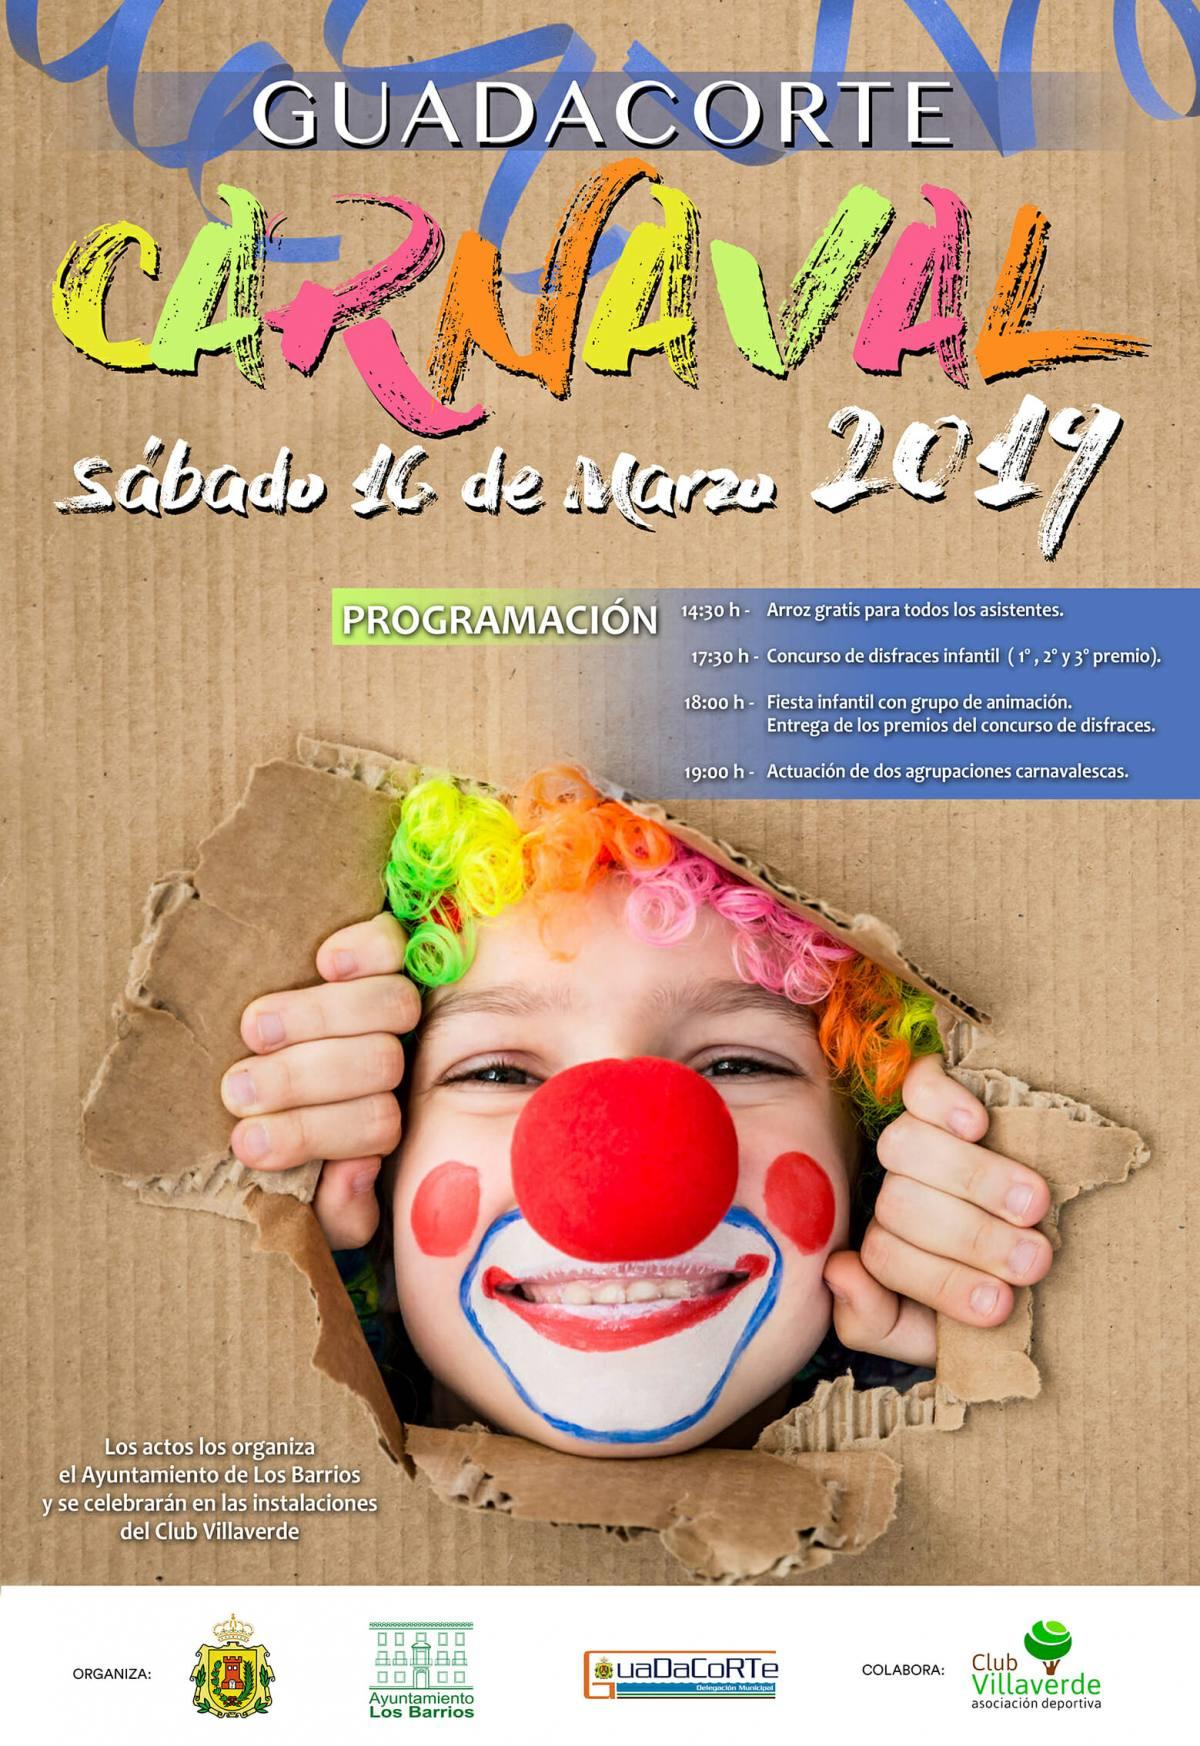 Carnaval Guadacorte